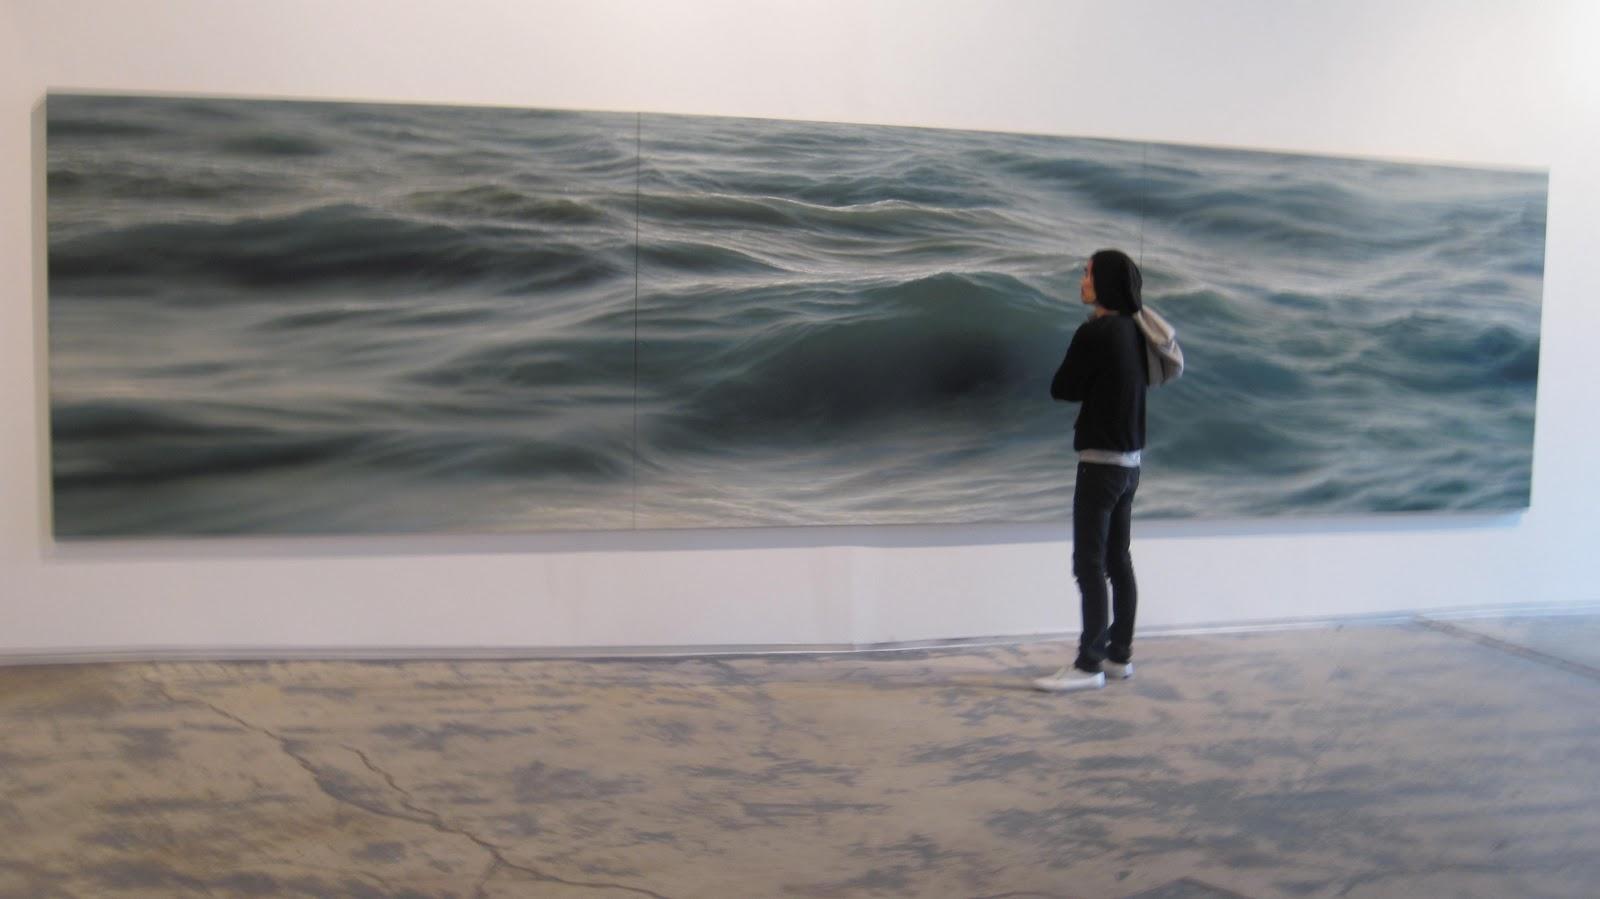 Eccezionale OperArt [work 99] – Dipinto (di mare) di Ran Ortner (Stati Uniti  RT83